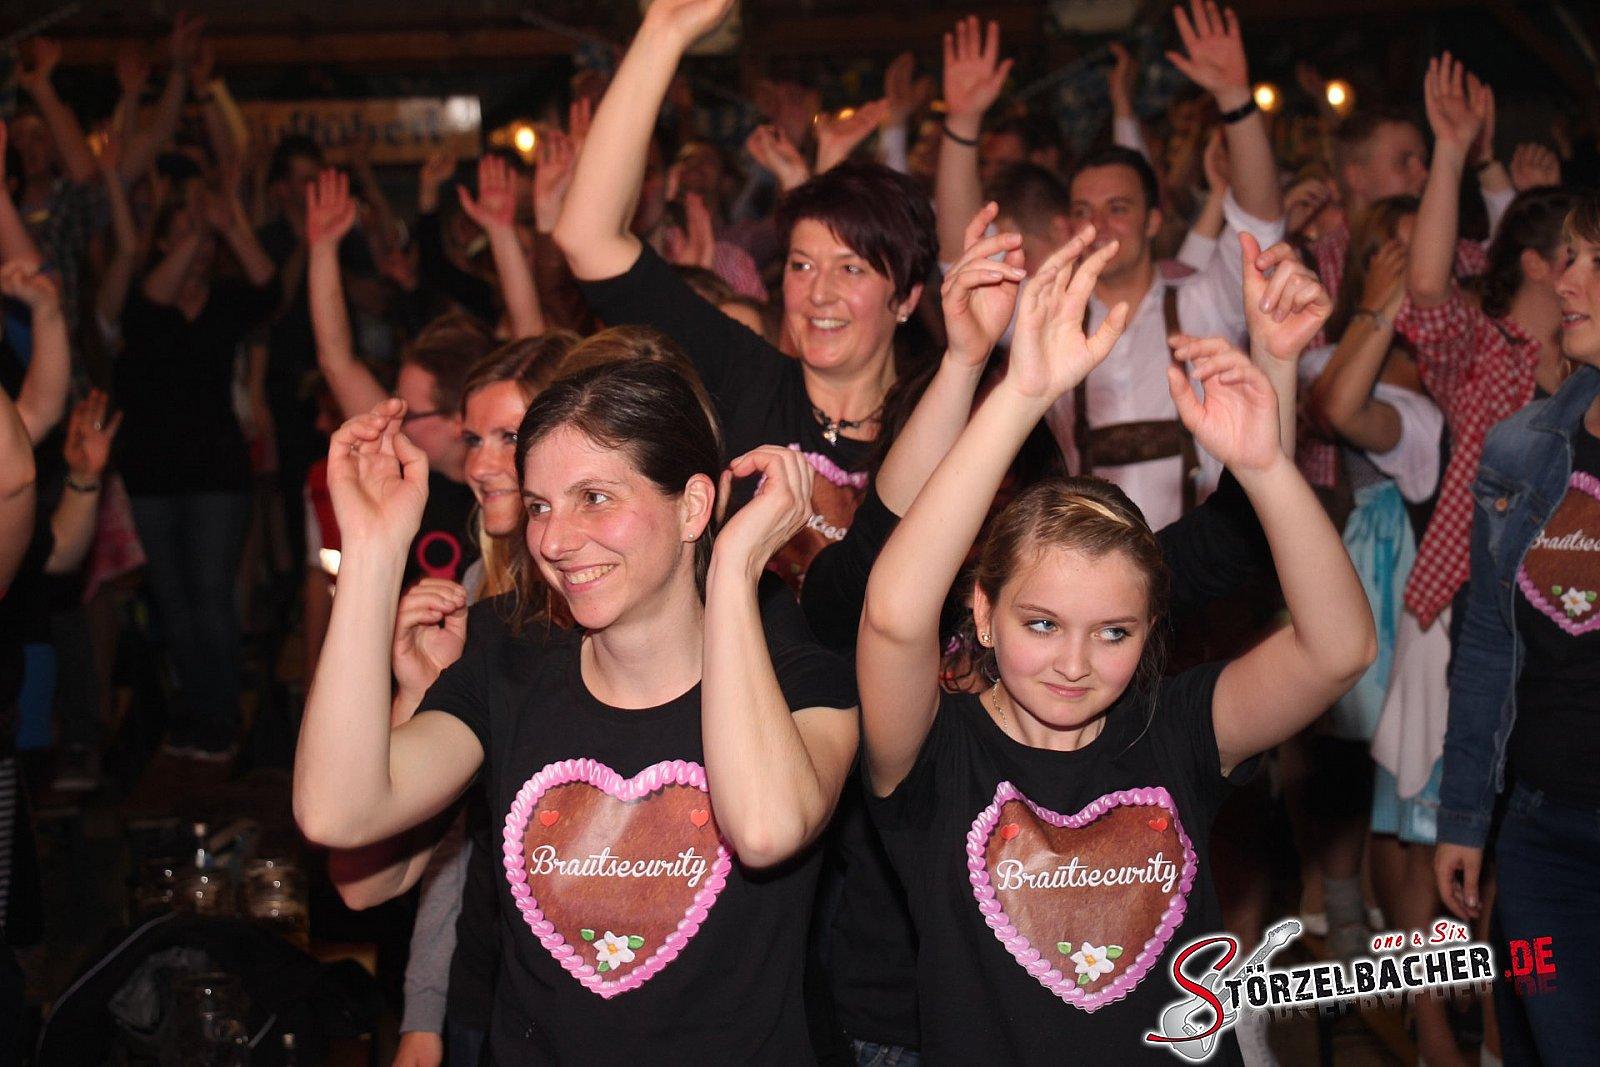 Marina Schaper Tanzschule: Home